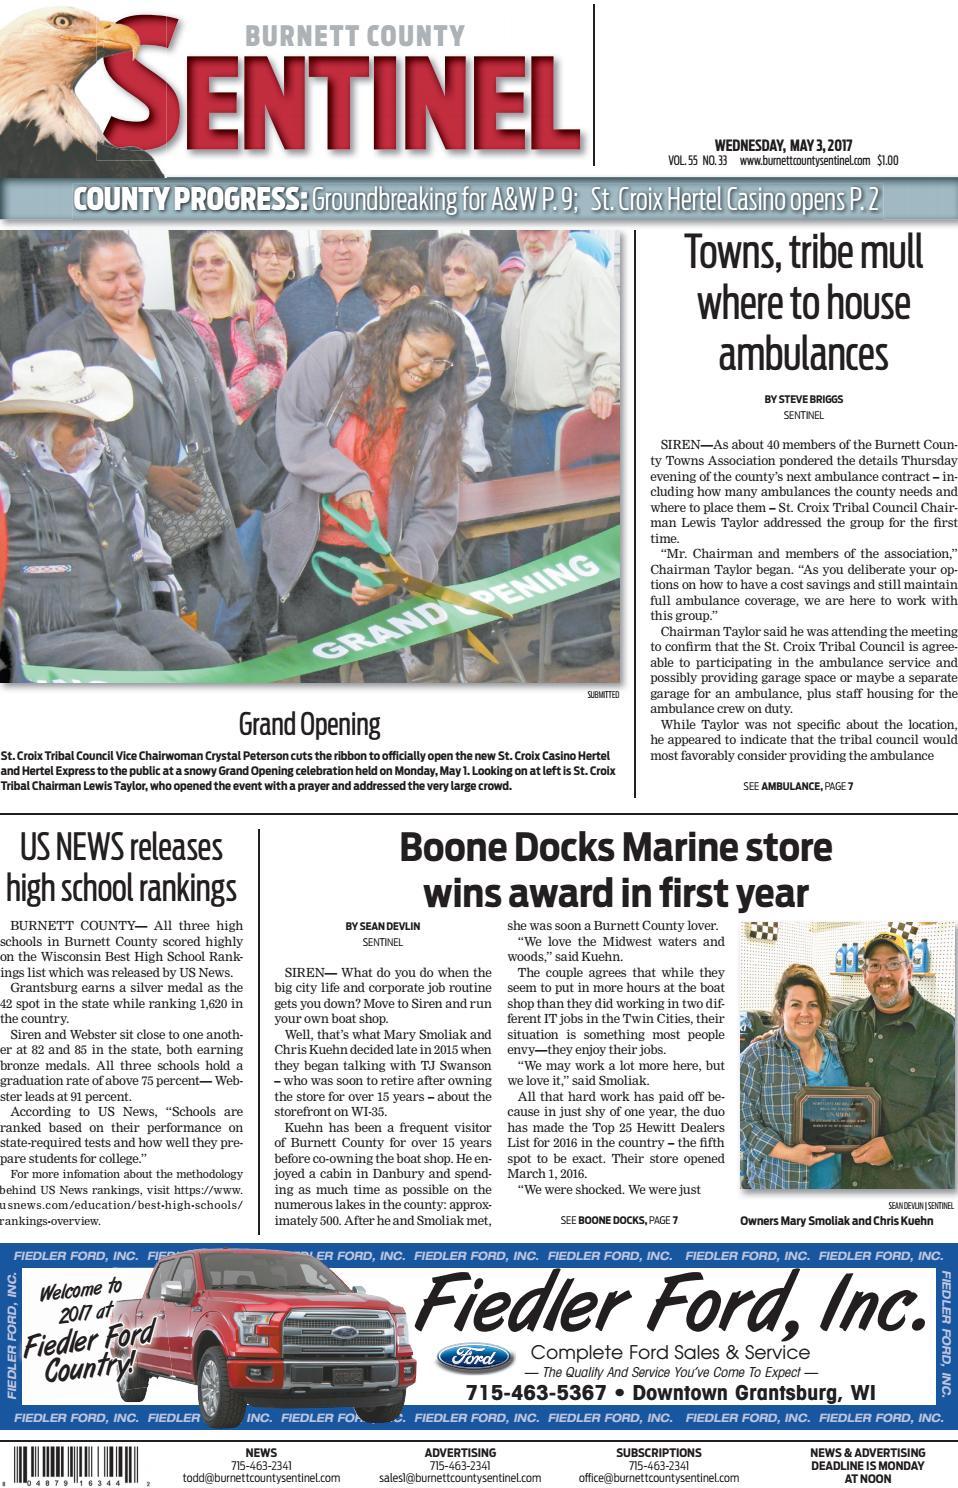 3f9d8dcfacb Burnett County Sentinel 05 03 17 by Burnett County Sentinel - issuu